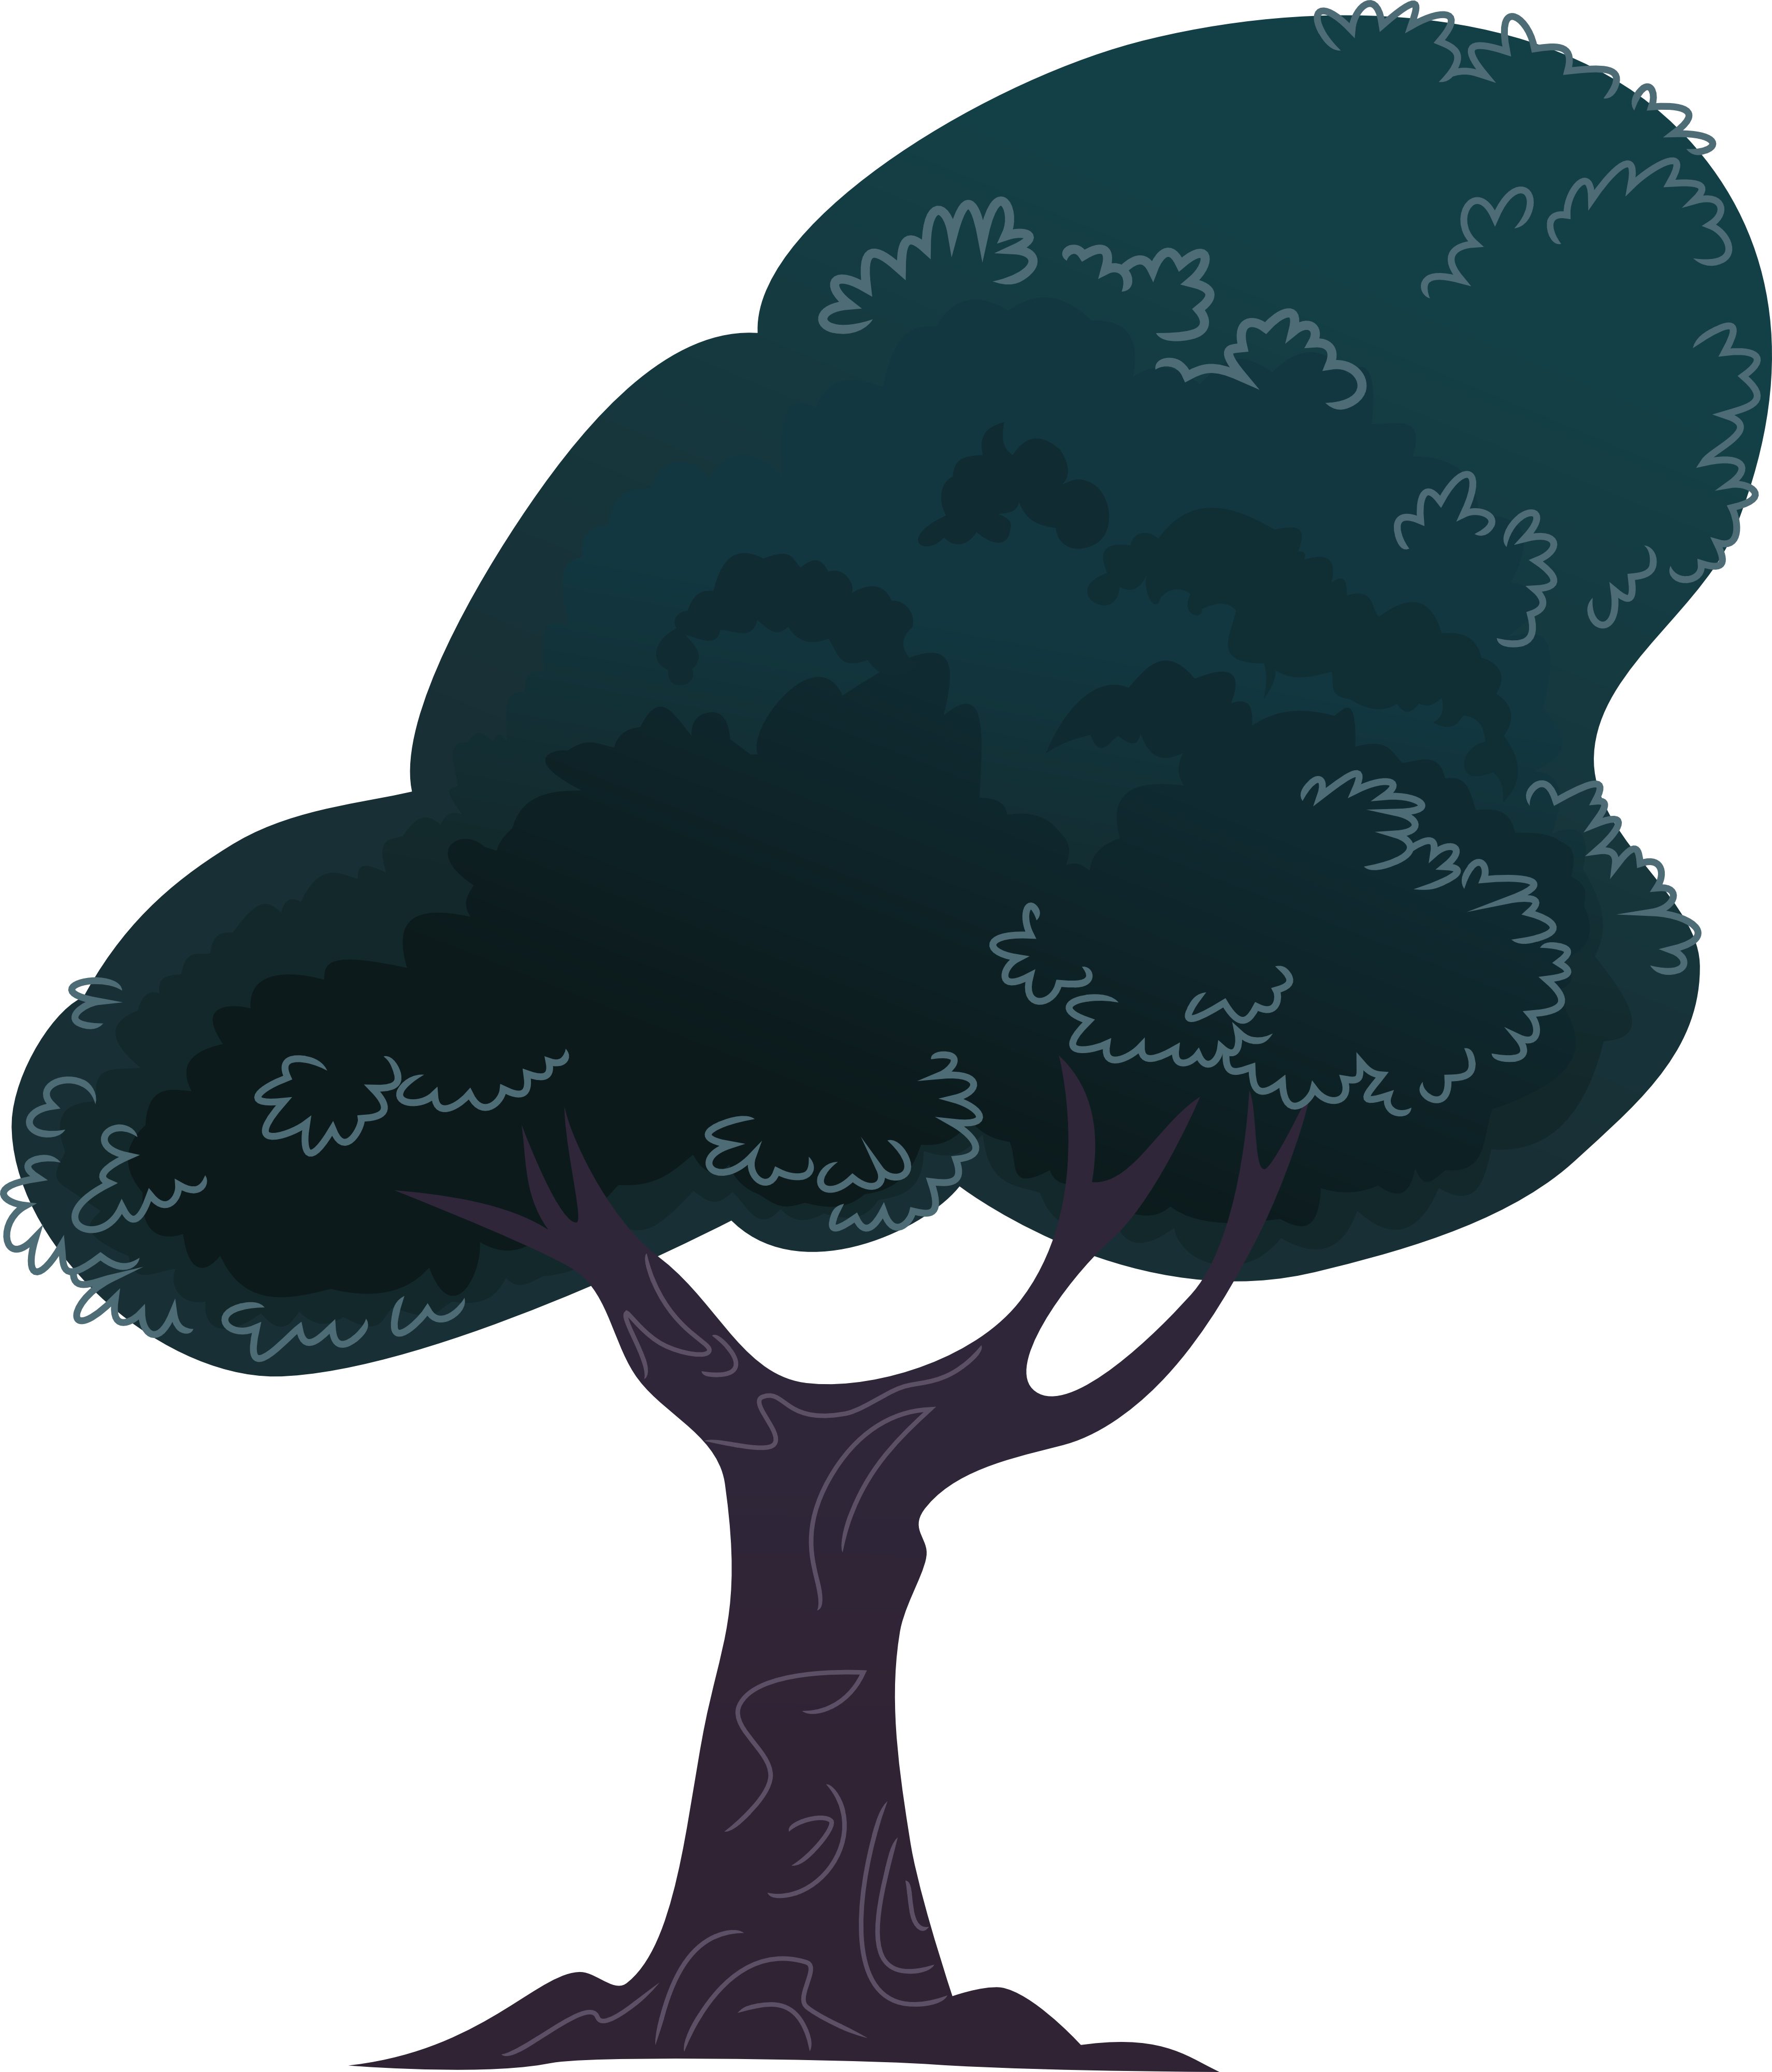 Dark Tree by Ambassad0r